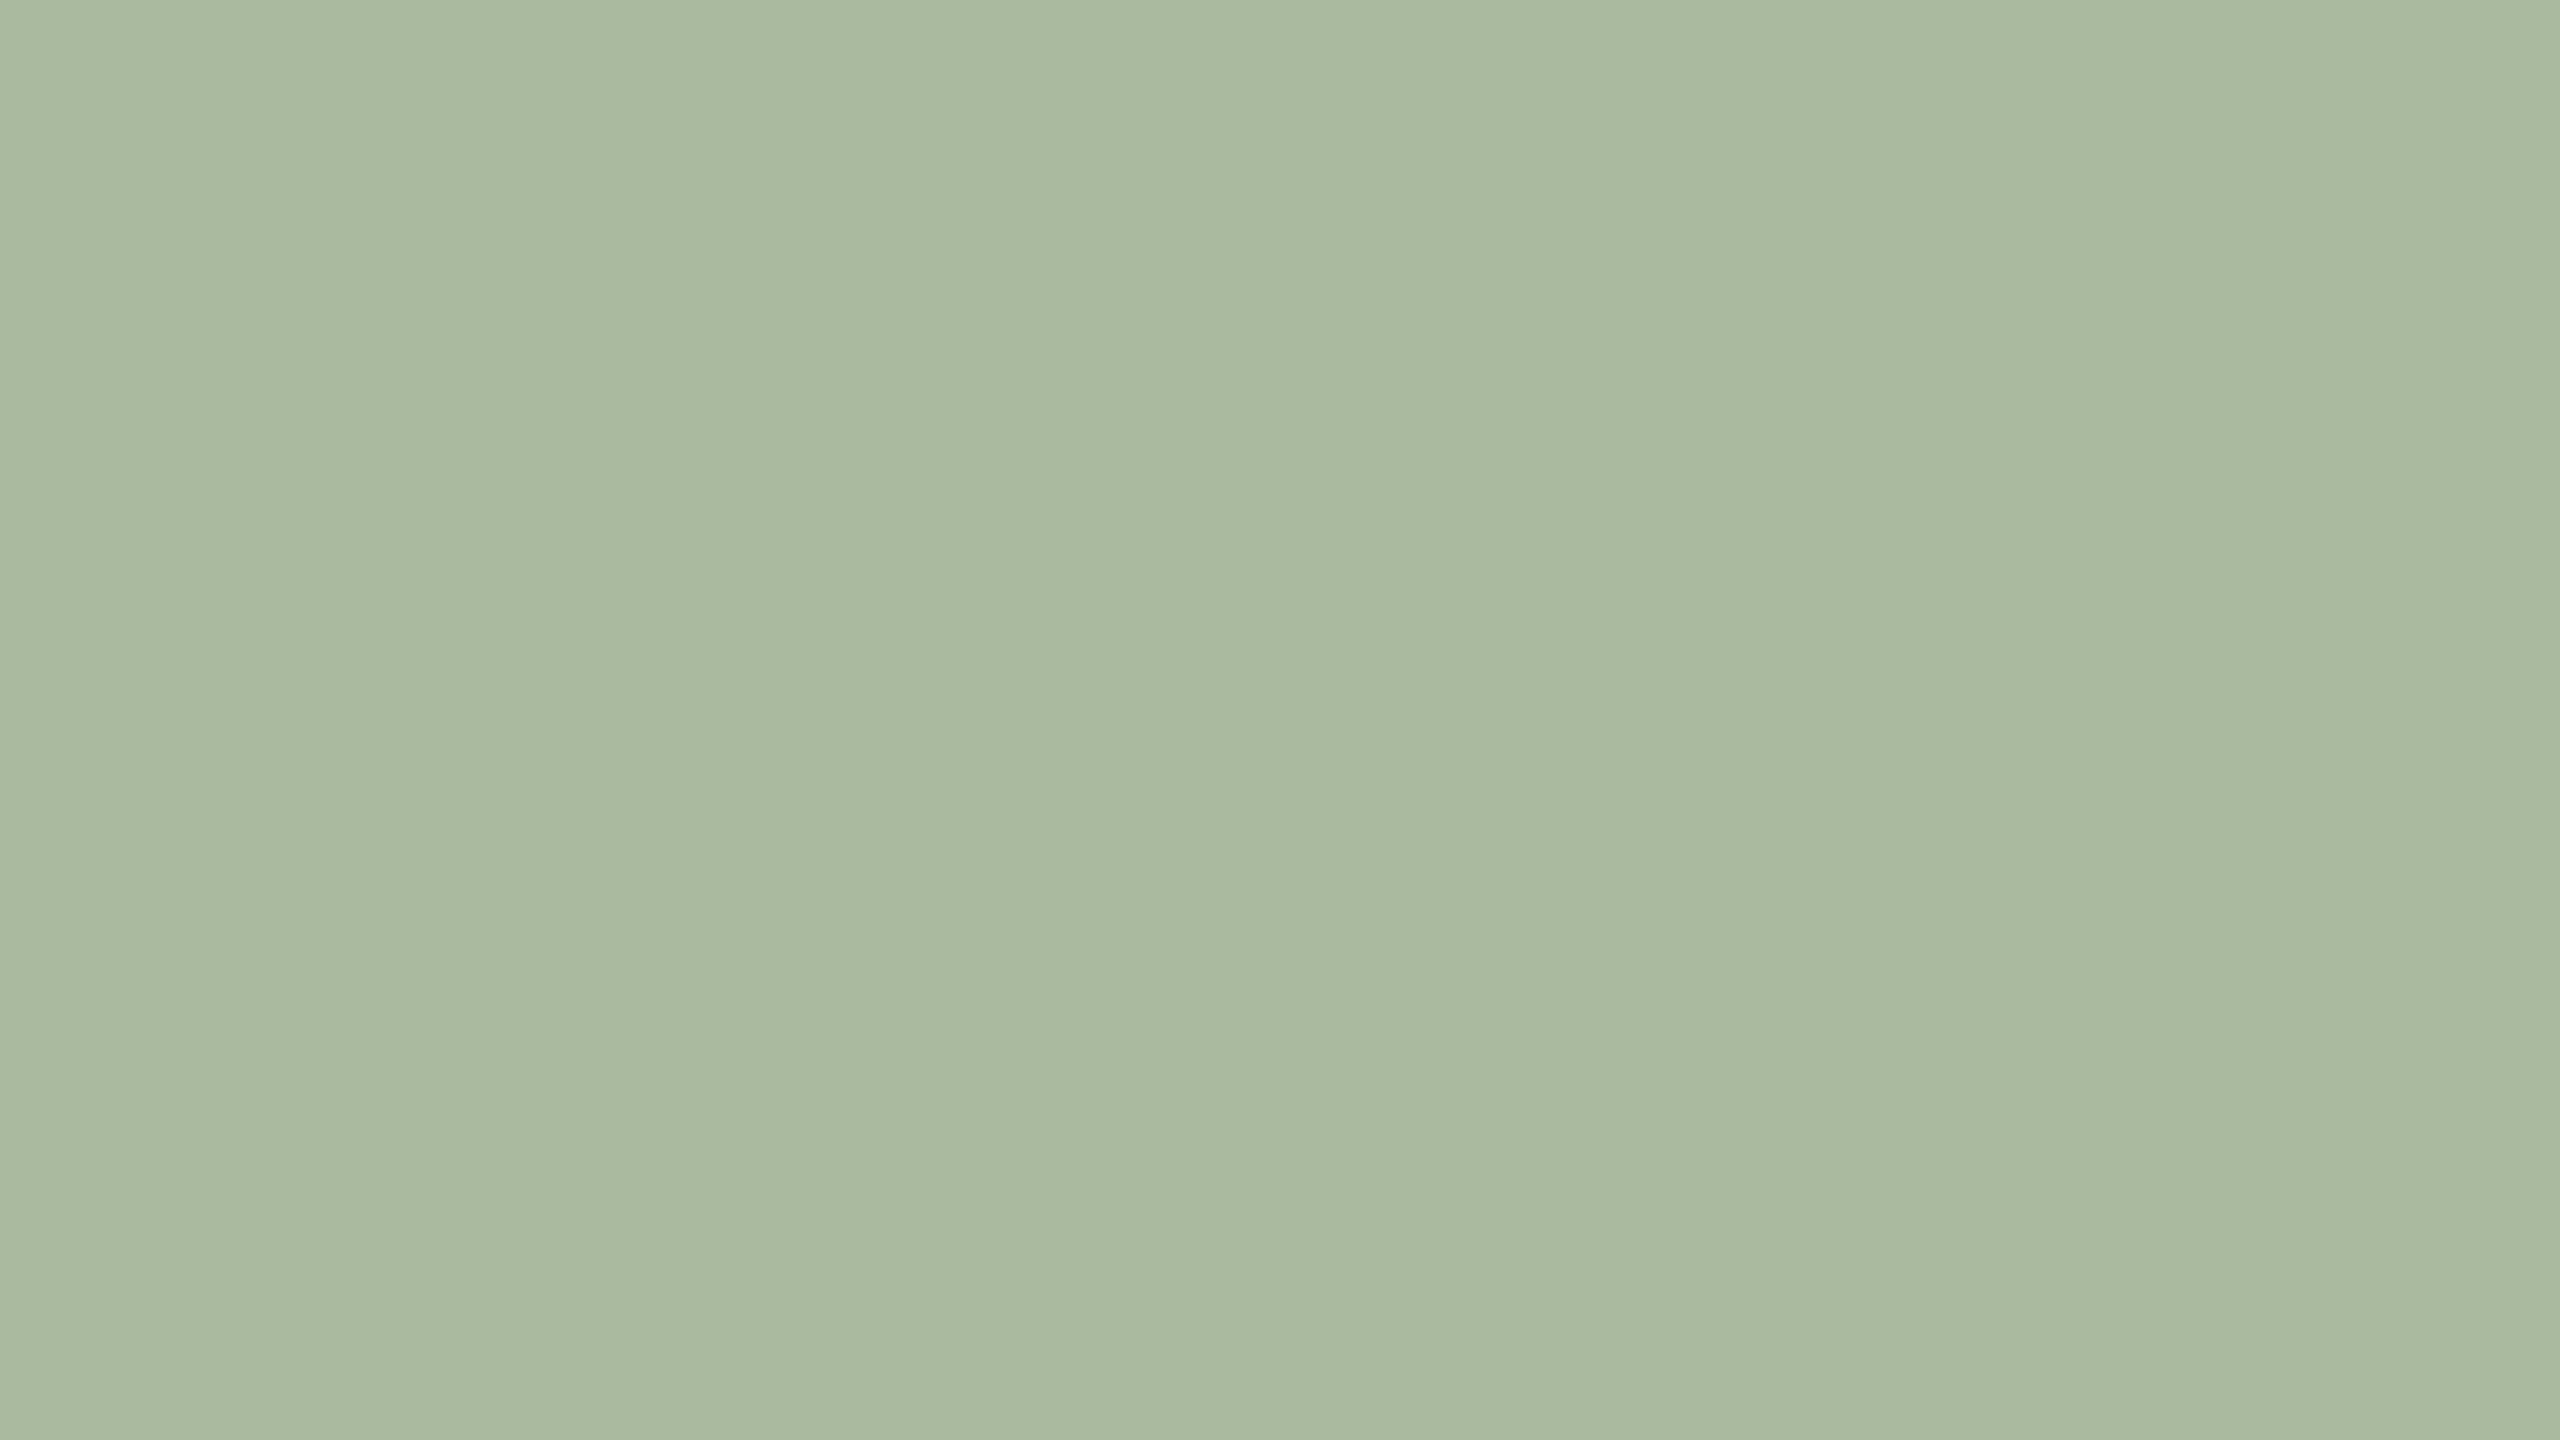 2560x1440 Laurel Green Solid Color Background